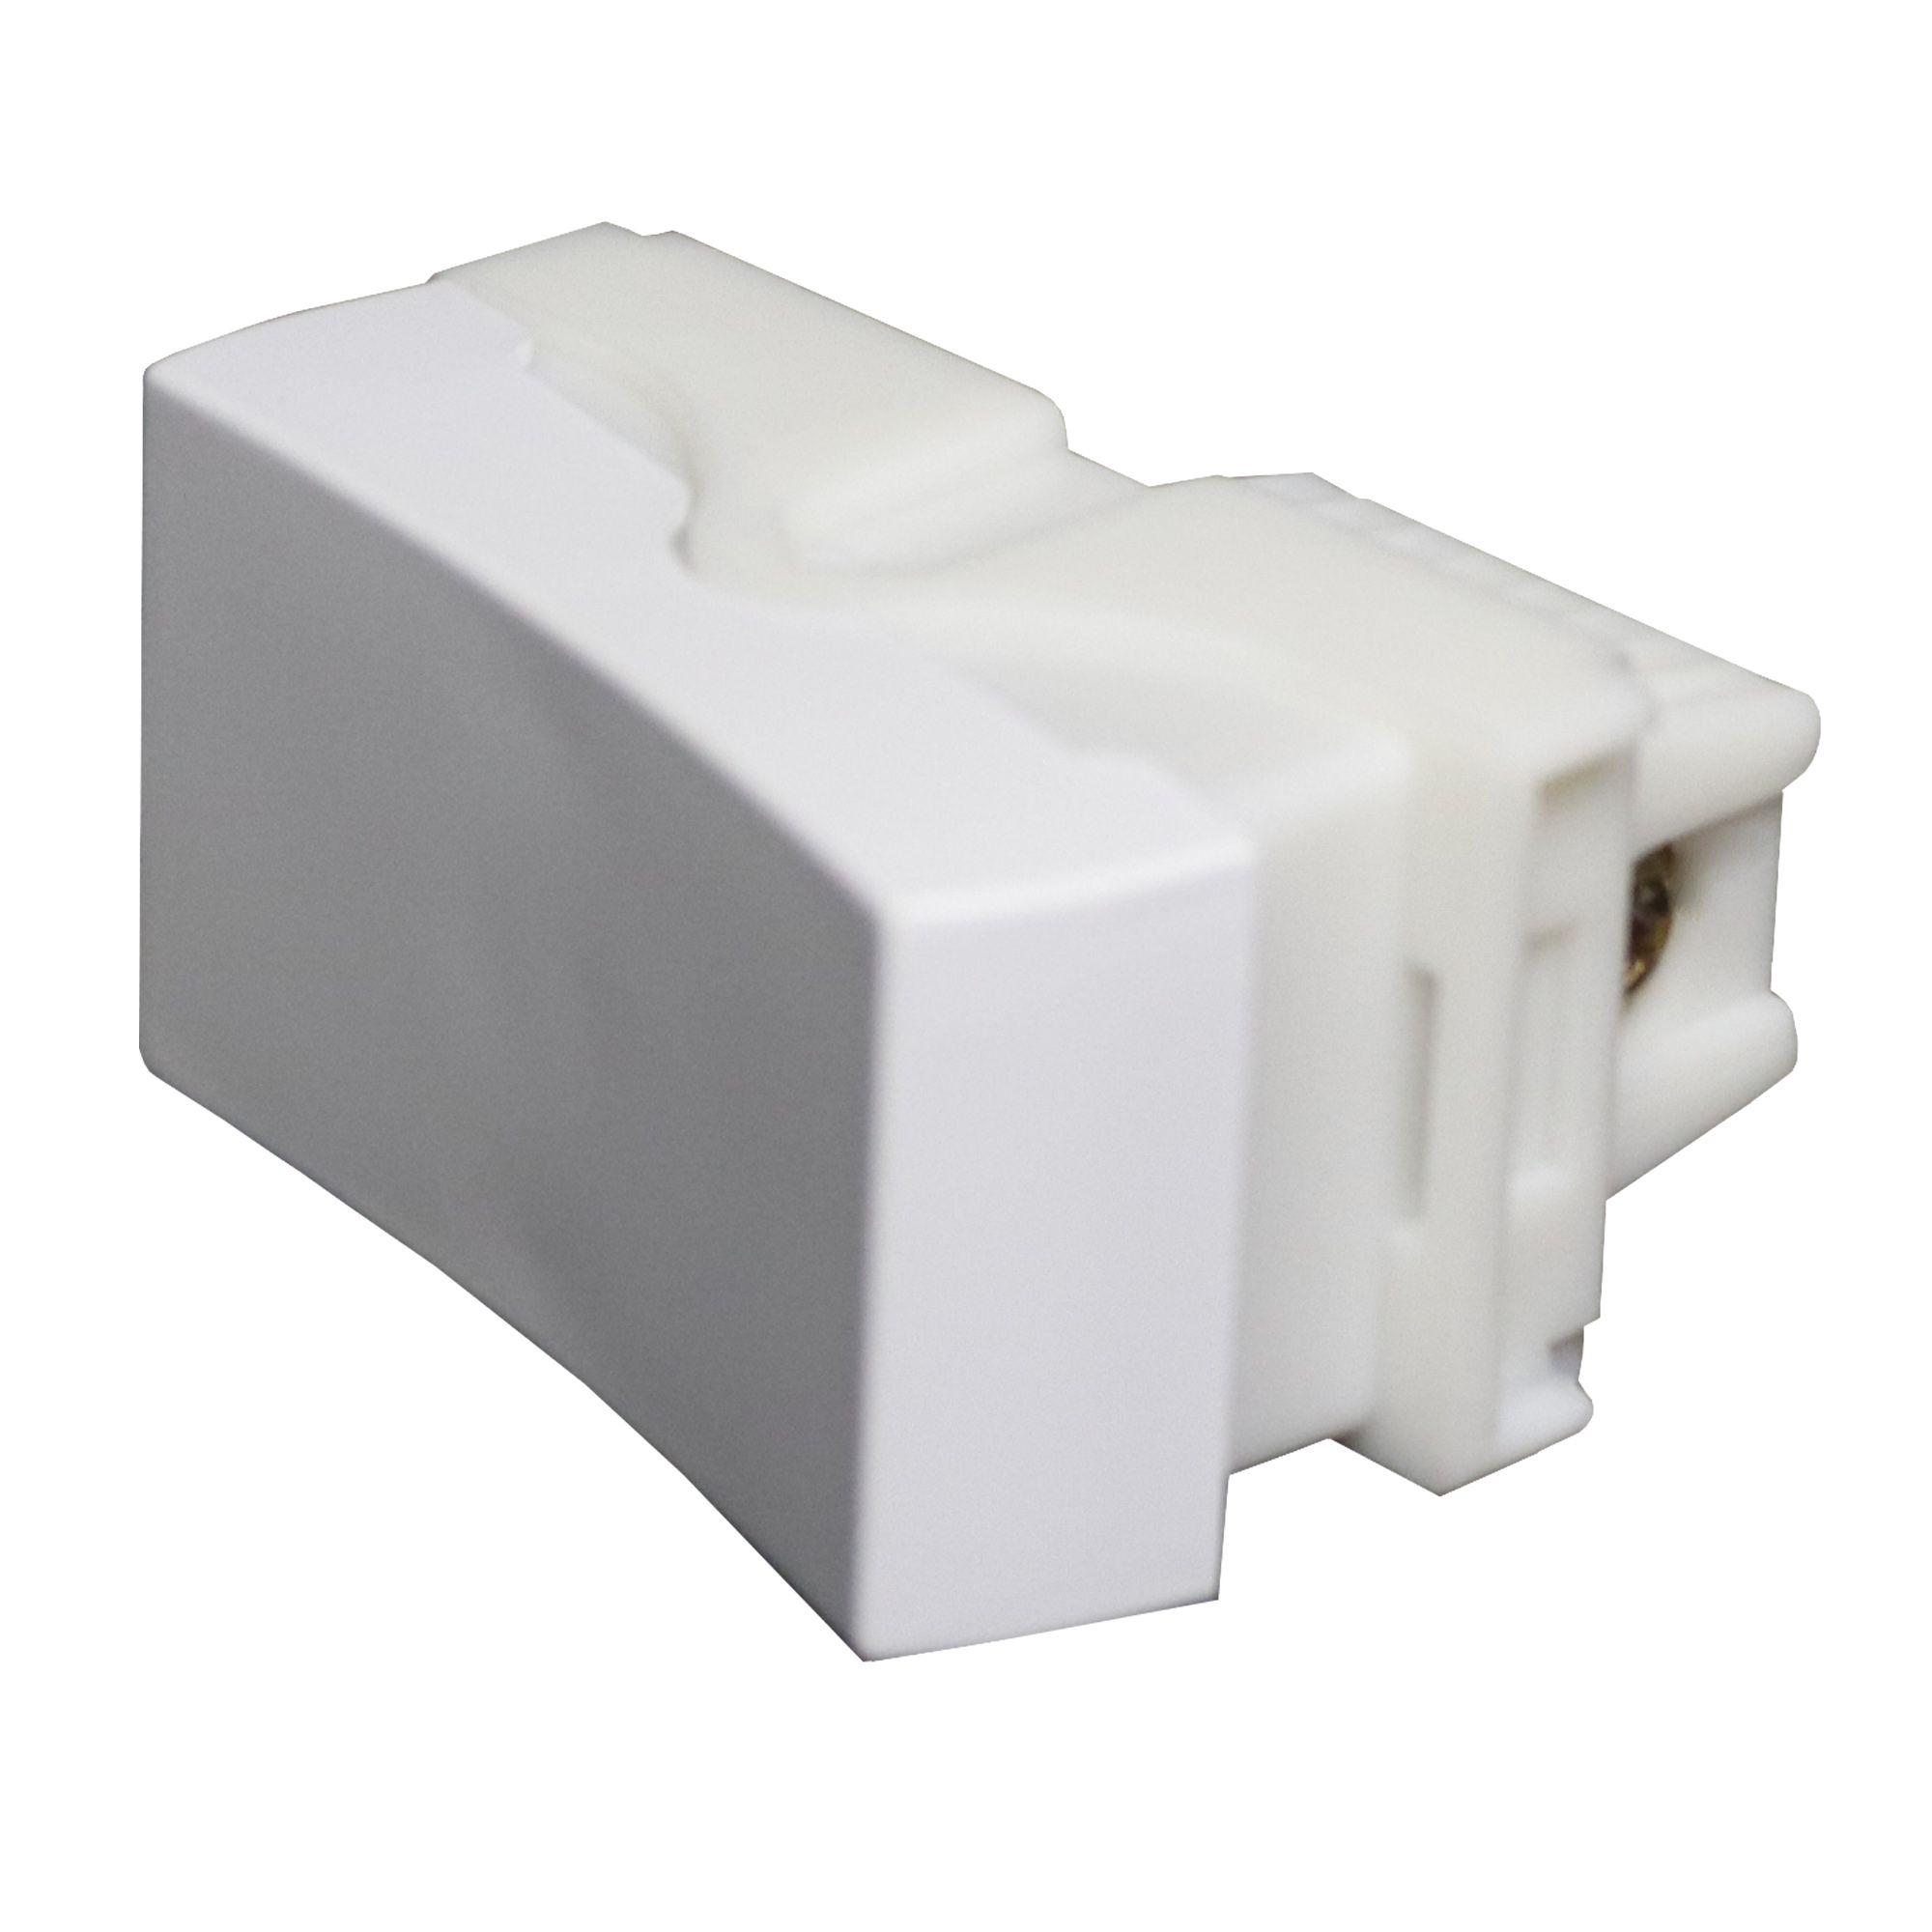 Módulo Interruptor Simples 10A 250V - Linha Slim Ilumi - 8117